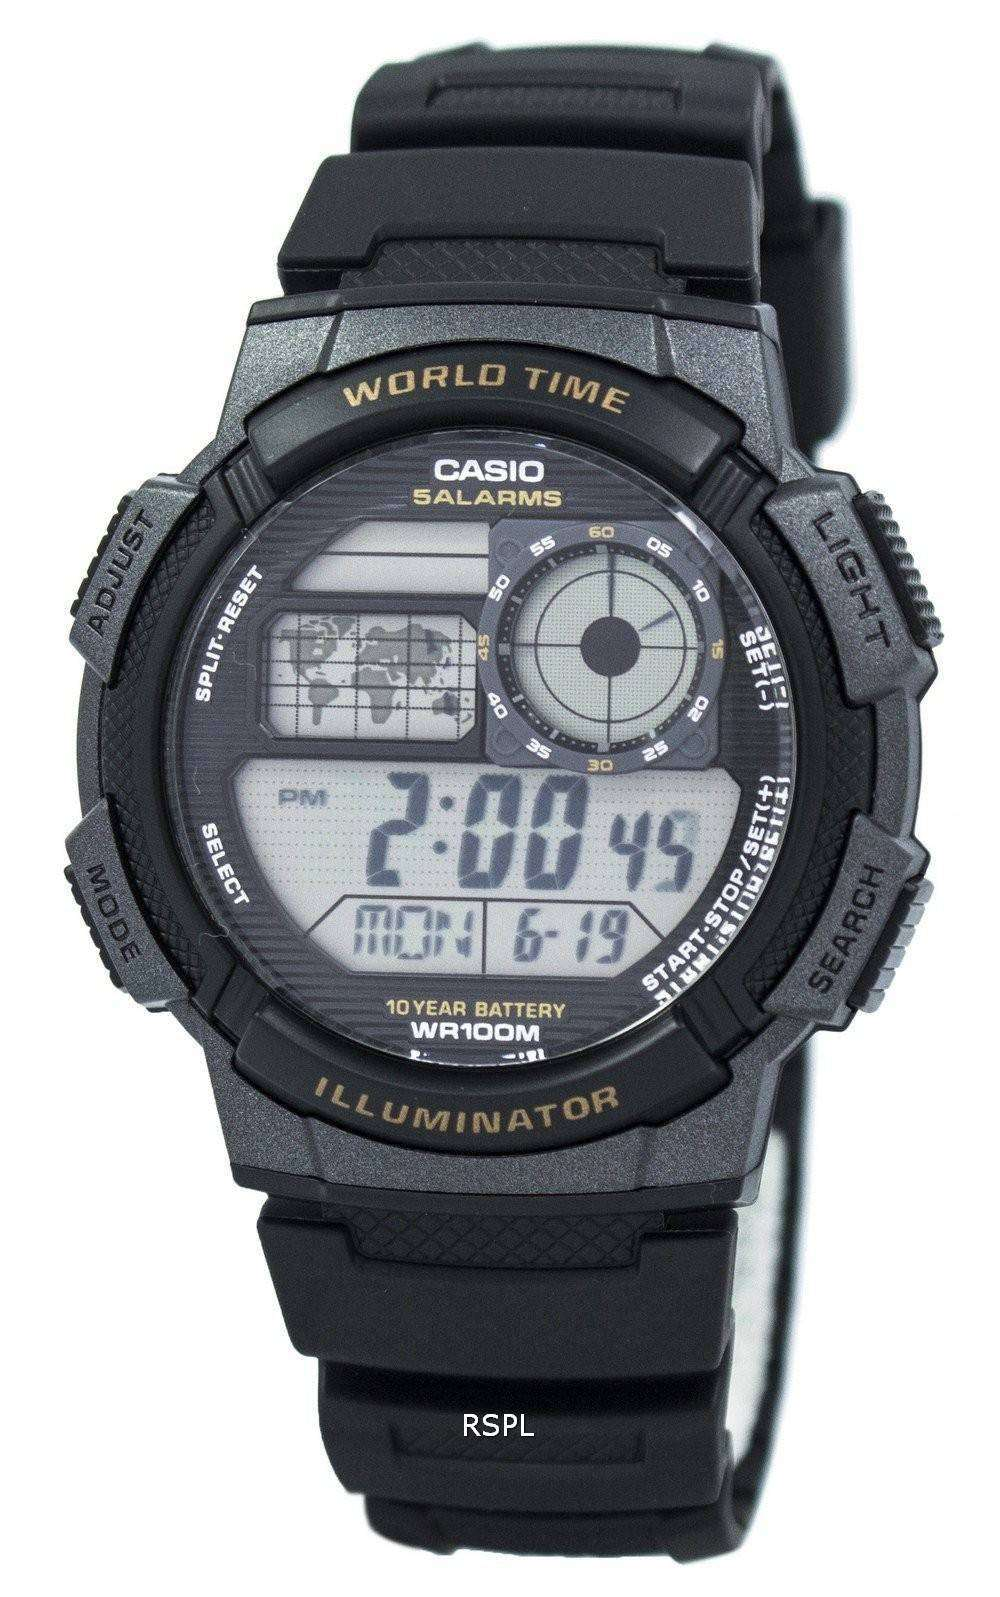 fd38c335ad37 Reloj de Casio juvenil mundo Digital tiempo AE-1000W-1AV hombre ...